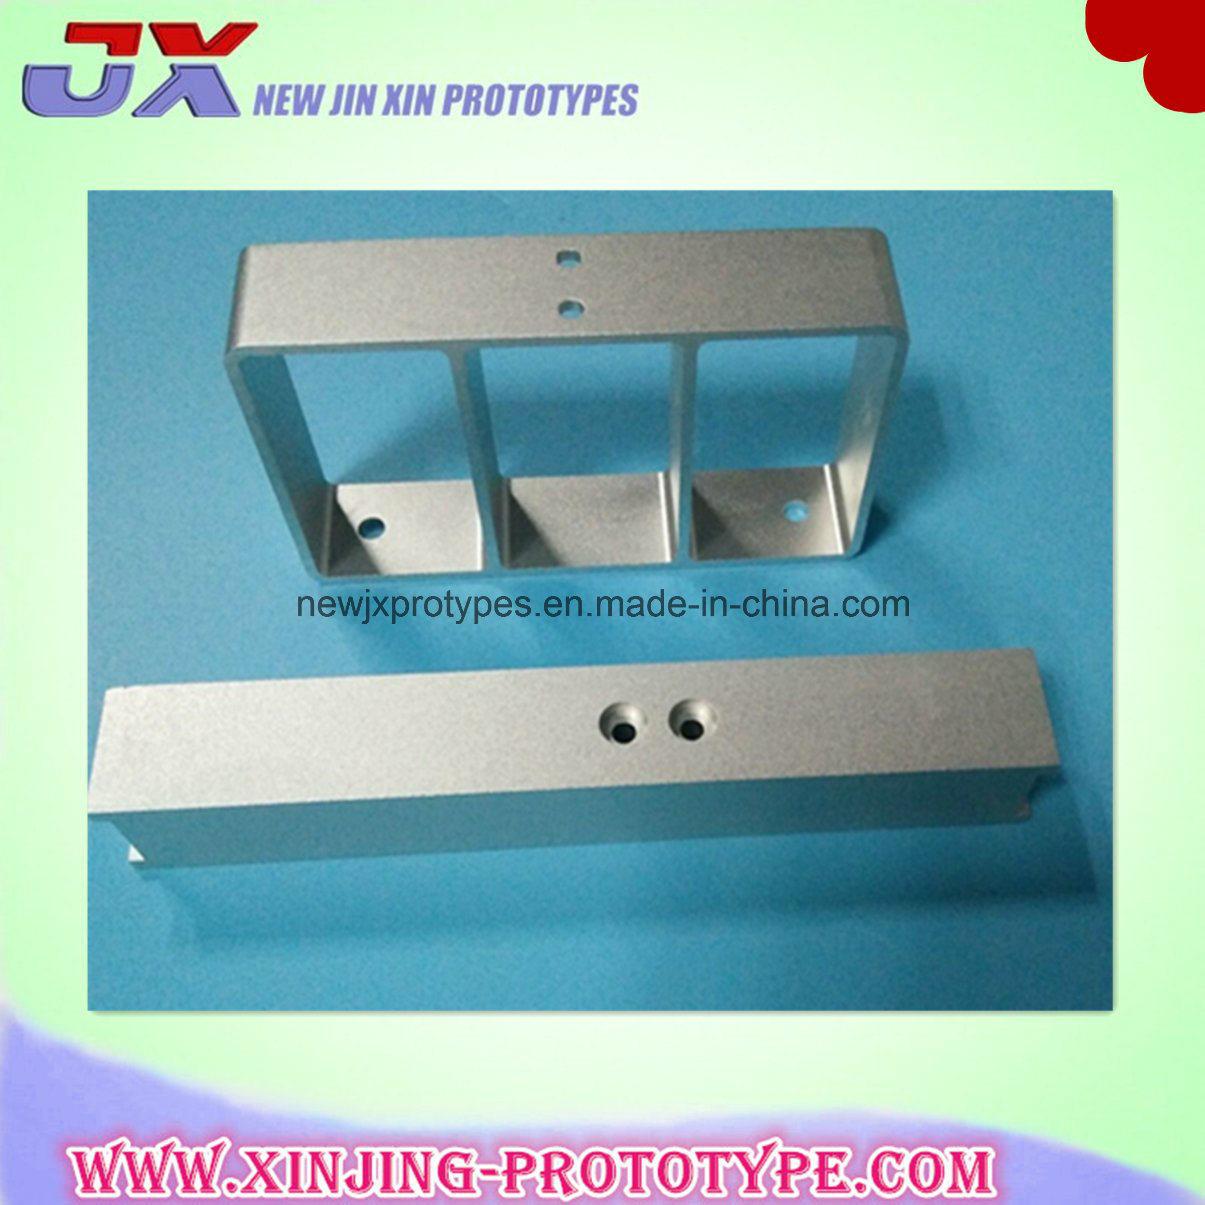 Metal Stamping/Rapid Prototypes/CNC Milling Parts/SLA SLS 3D Printing